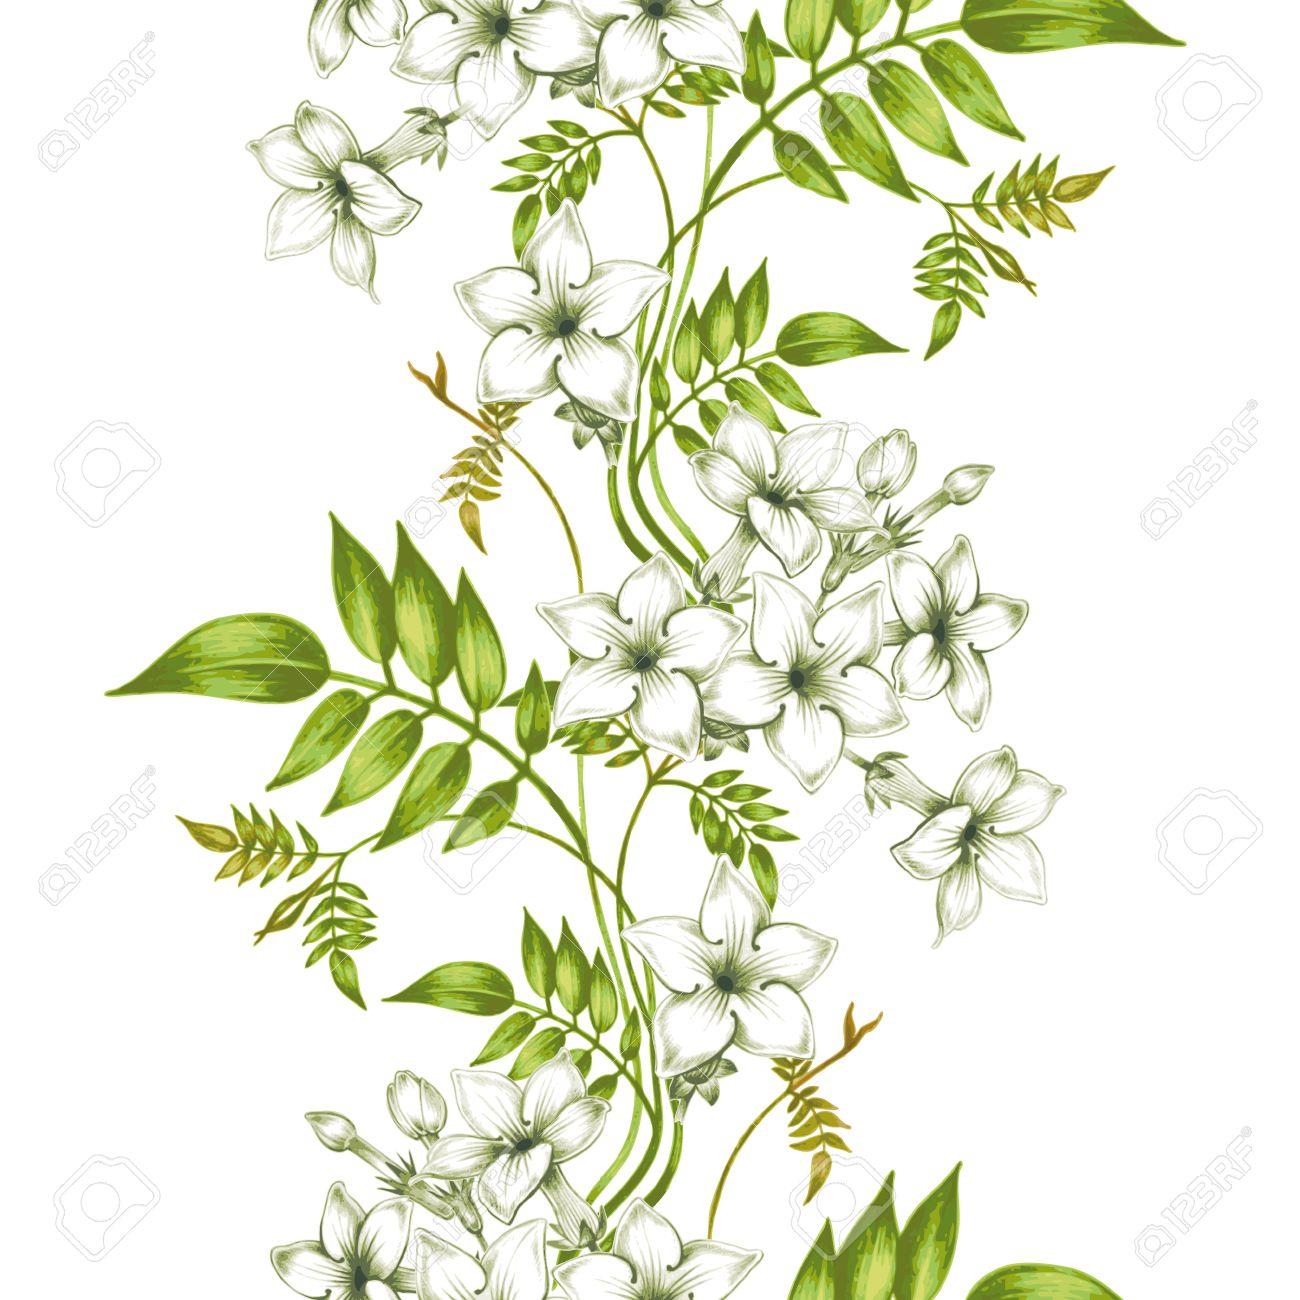 Vector seamless background jasmine flowerssign for fabrics jasmine flowerssign for fabrics textiles paper wallpaper izmirmasajfo Gallery